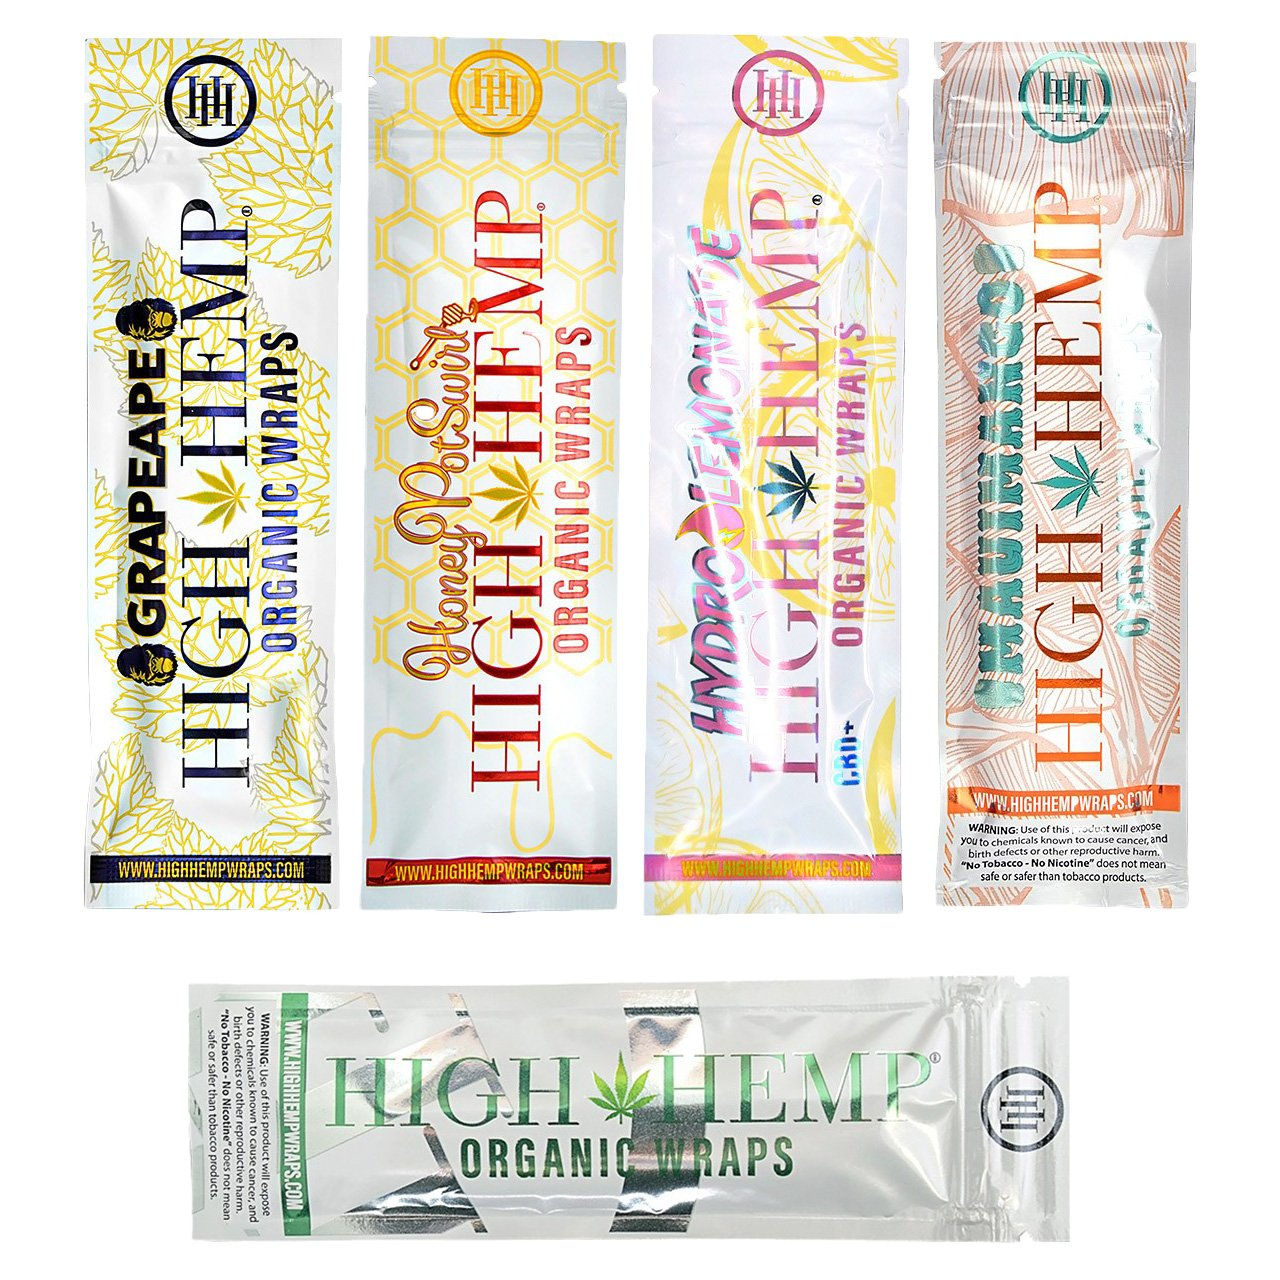 25 Count Variety Pack of Organic Wraps - Tobacco Free, Vegan, Non-GMO - 5 Packs Each of 5 Flavors - Grape Ape, Honey Pot Swirl, Maui Mango, Original, Hydro Lemonade + Beamer Smoke Sticker